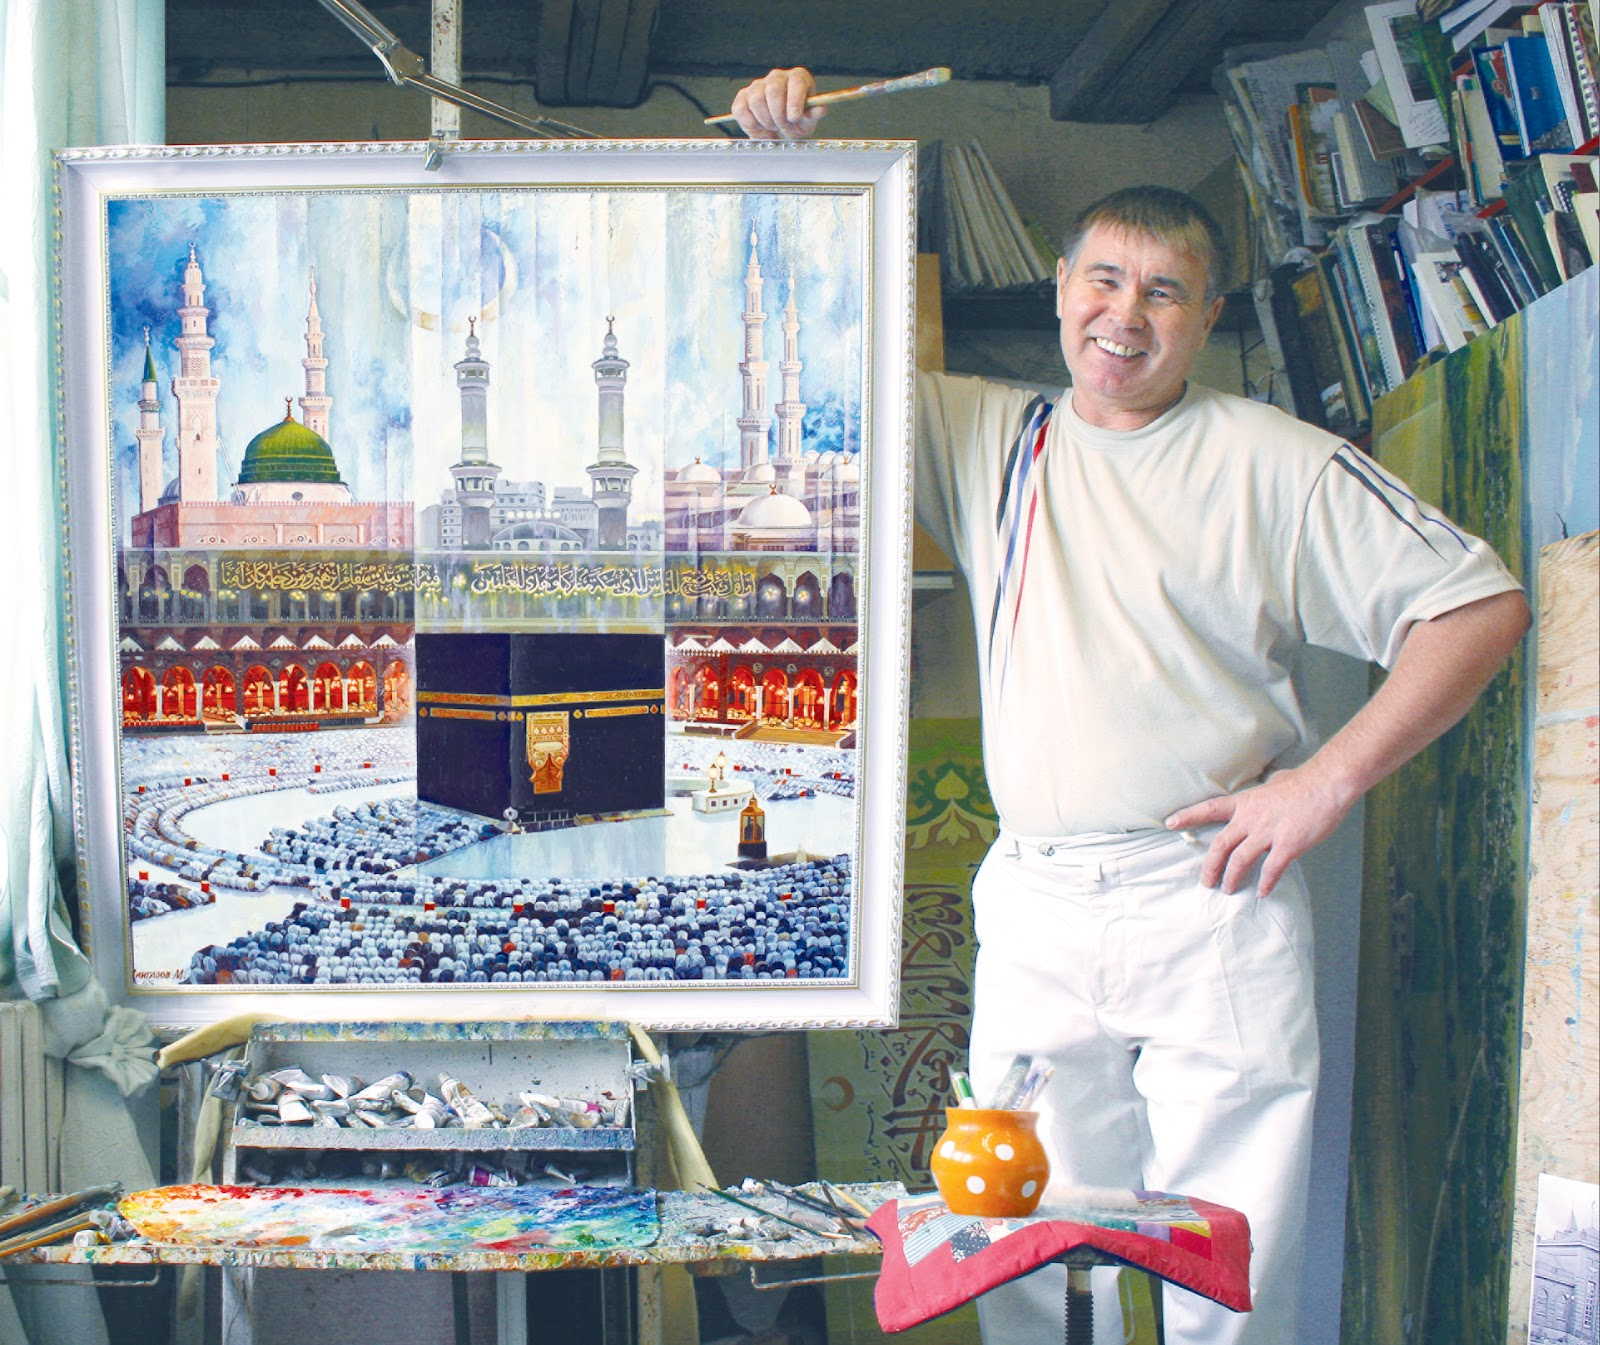 Мингазов мударис член союза художников